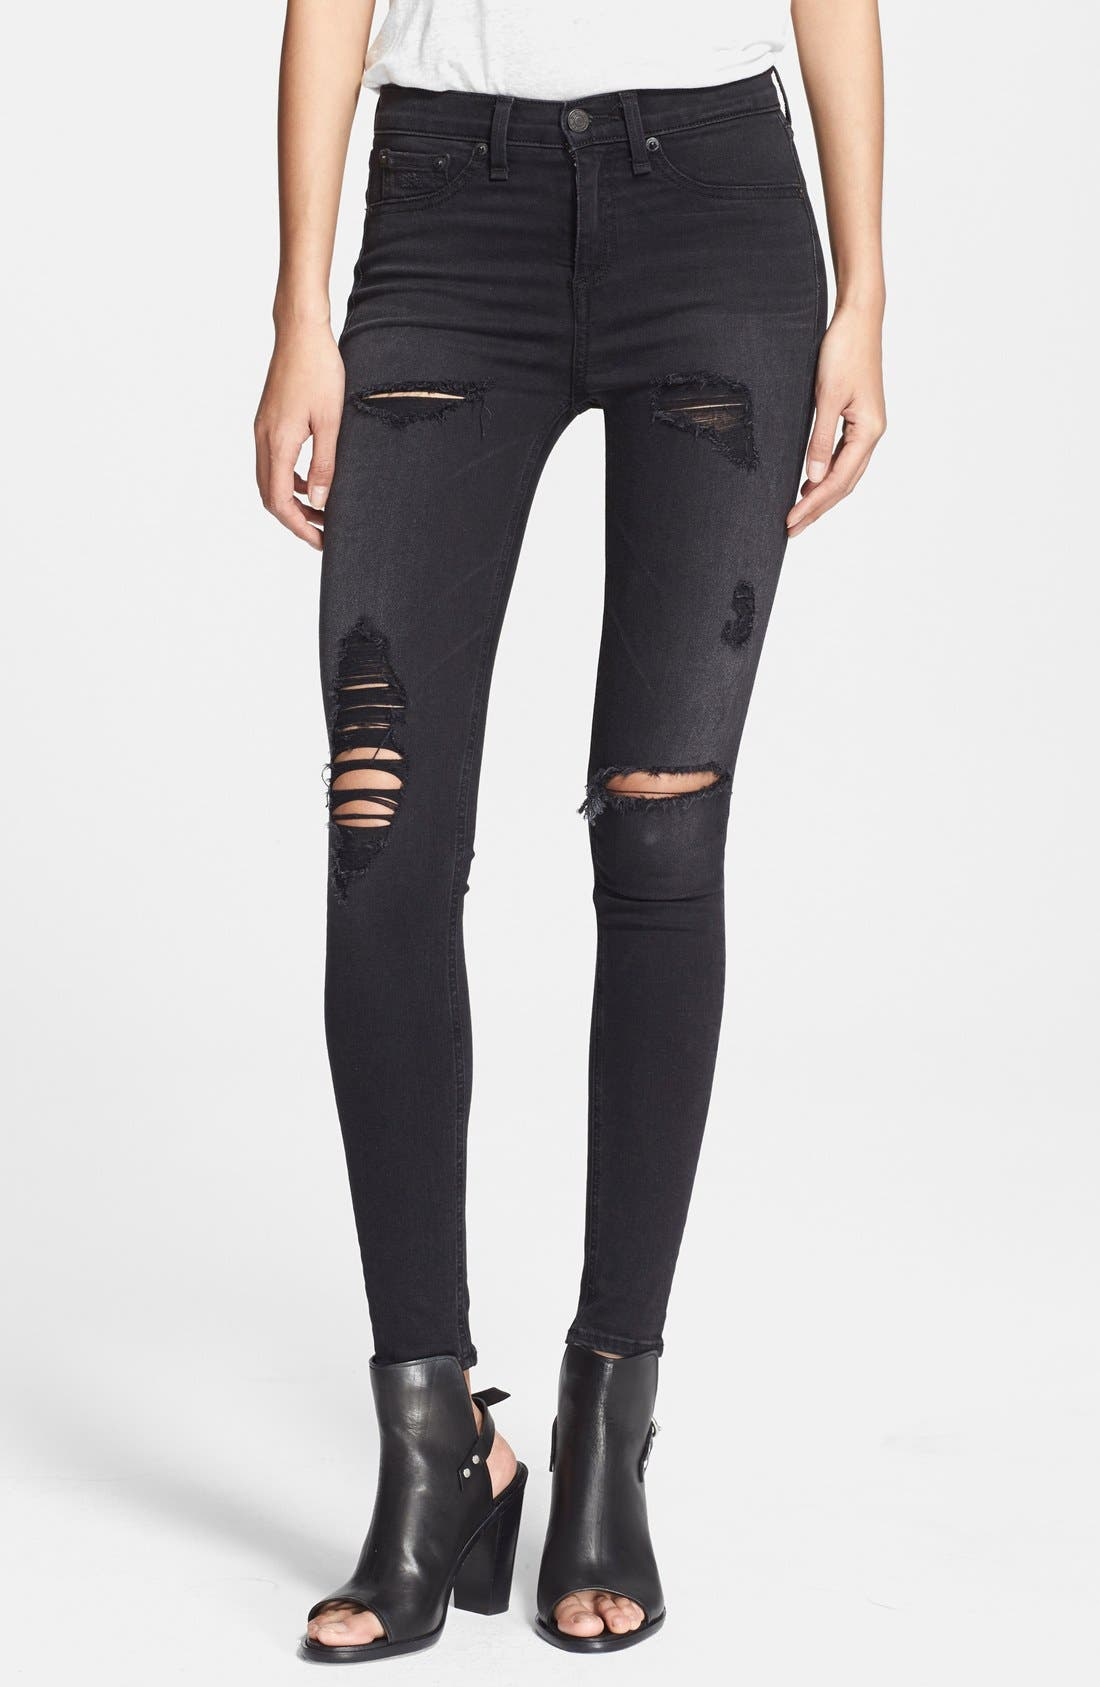 RAG & BONE JEAN High Rise Ultra Skinny Jeans, Main, color, 001